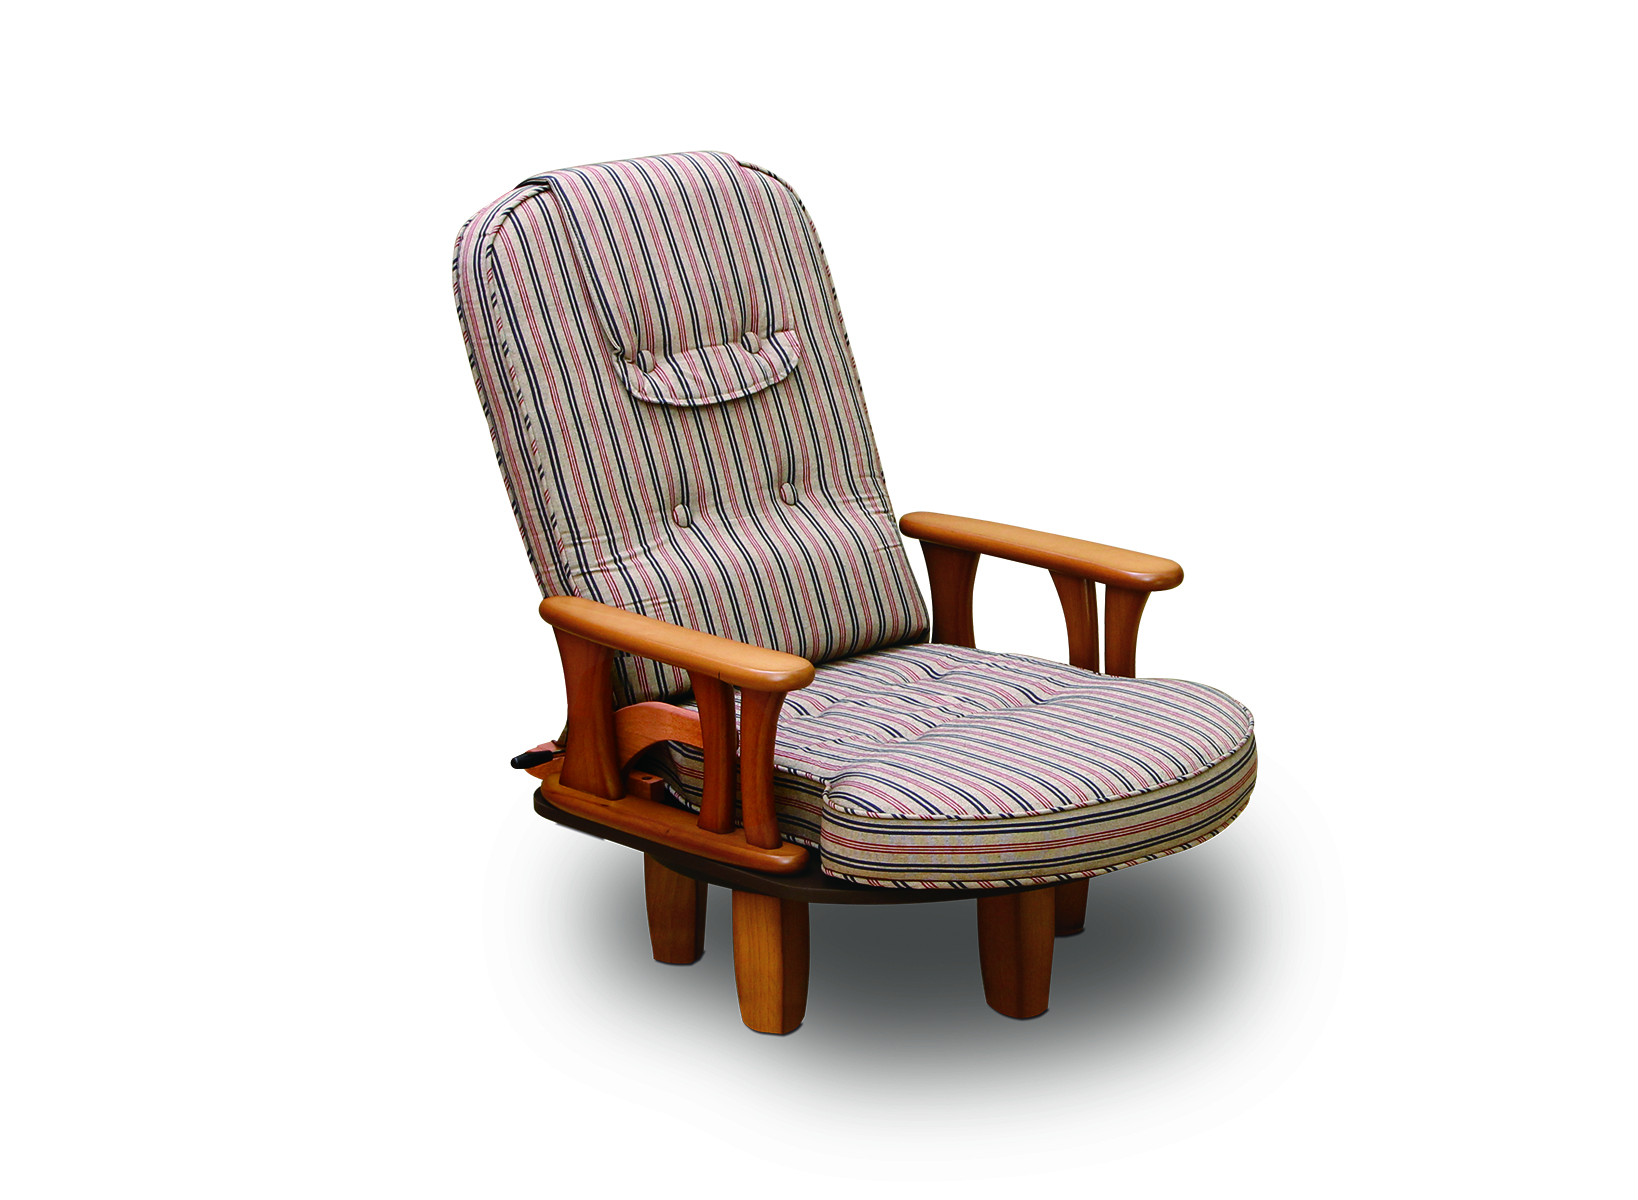 [NK-2242]回転肘付き座椅子パーソナルチェアー 無段階調整